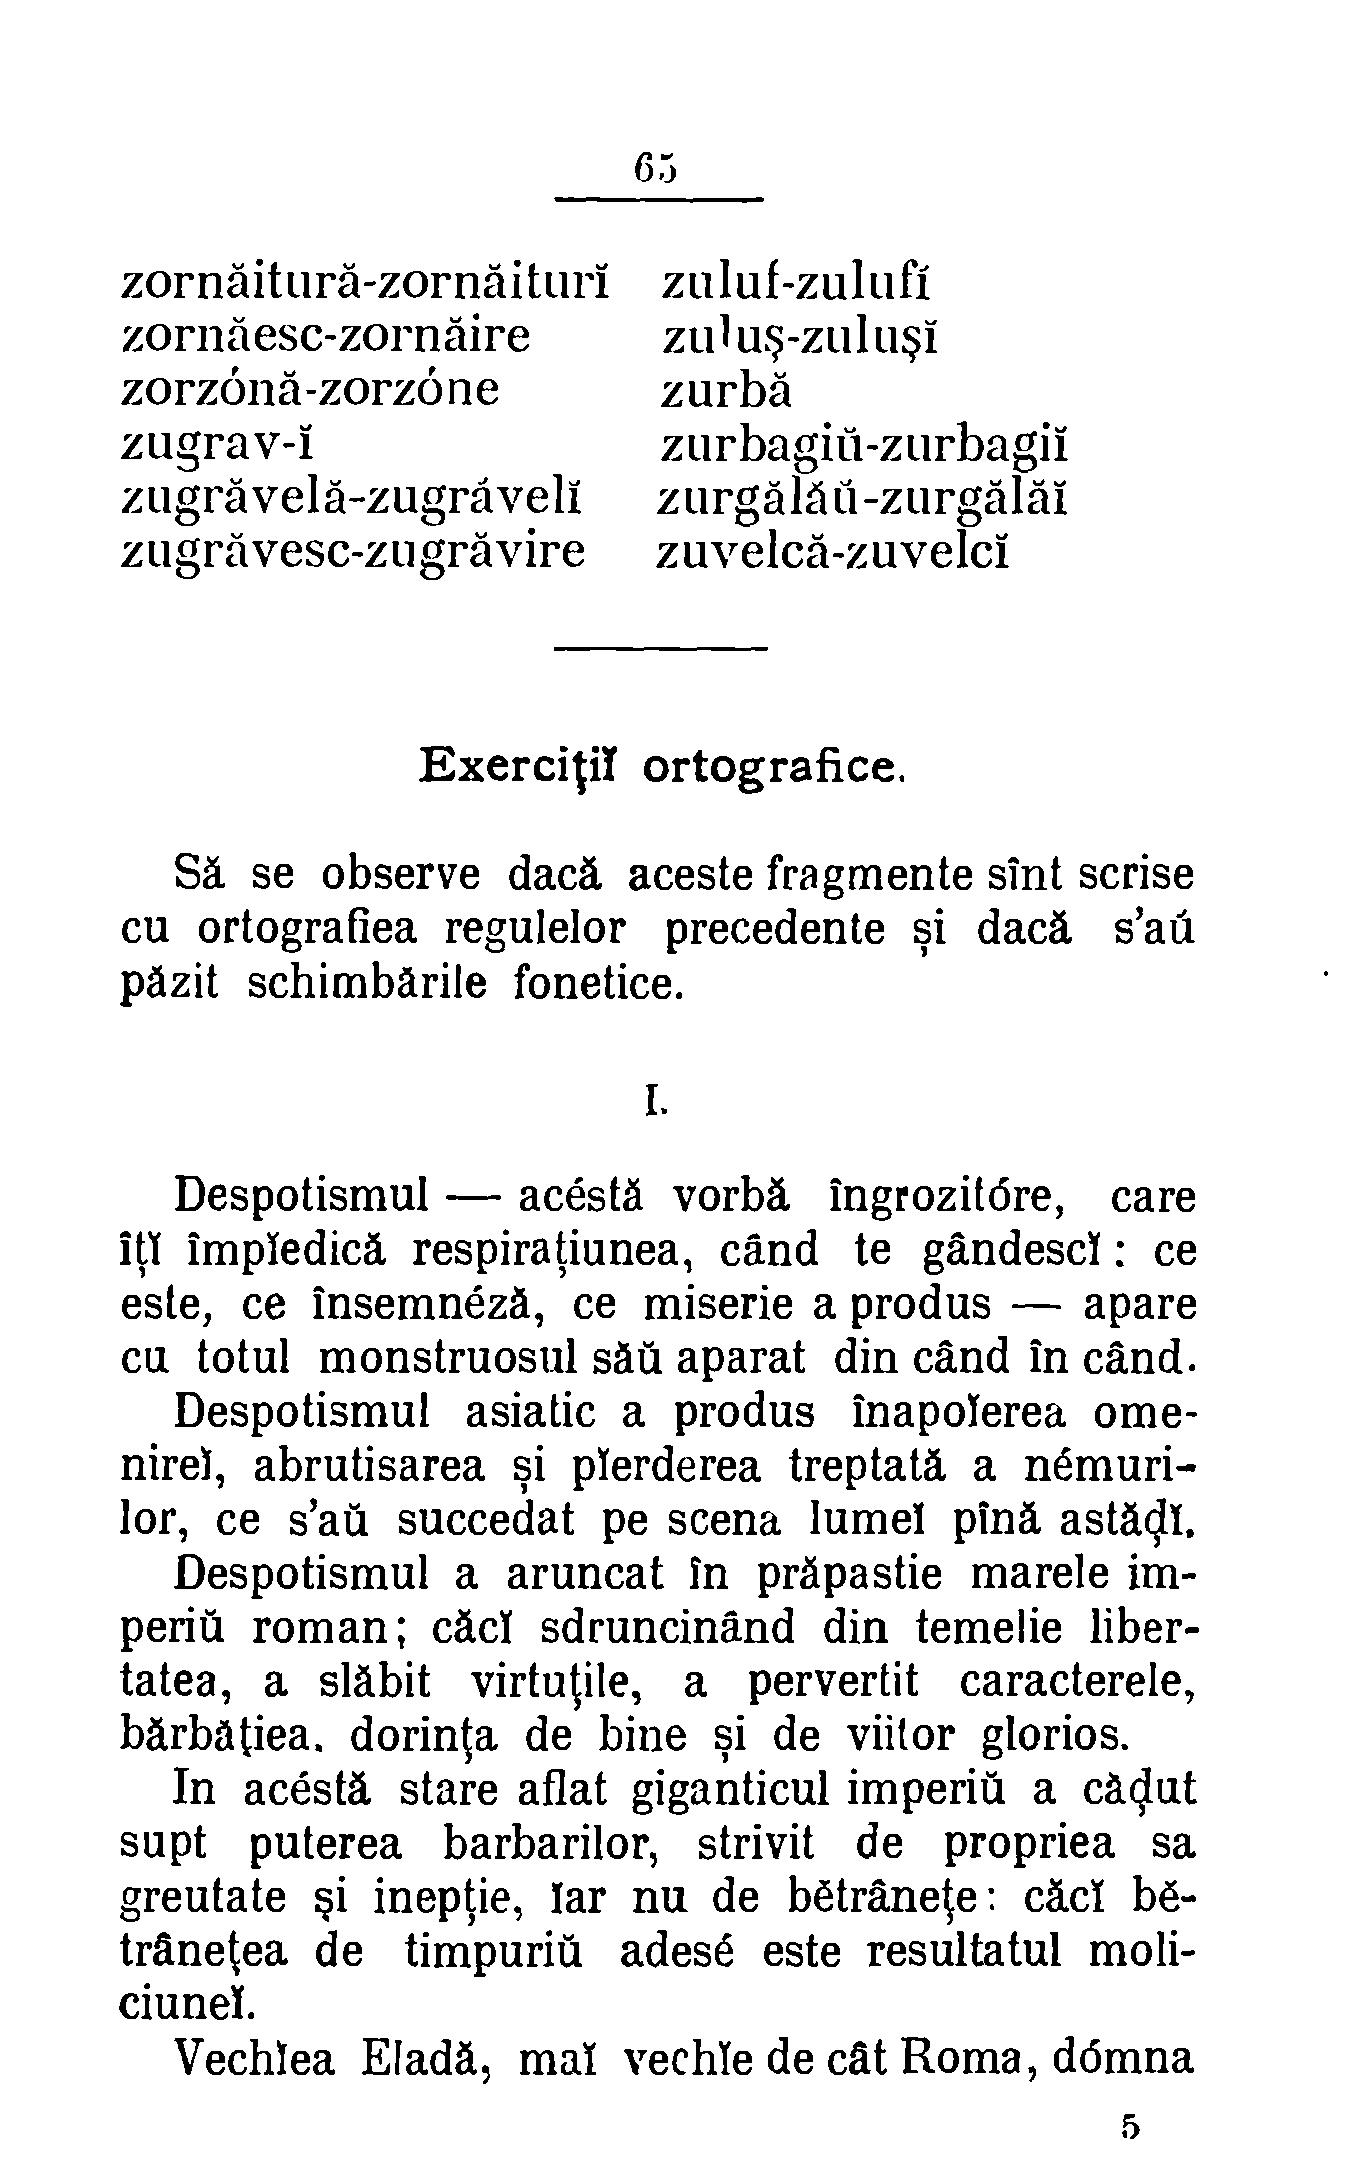 1899 - Ortografie (65).png